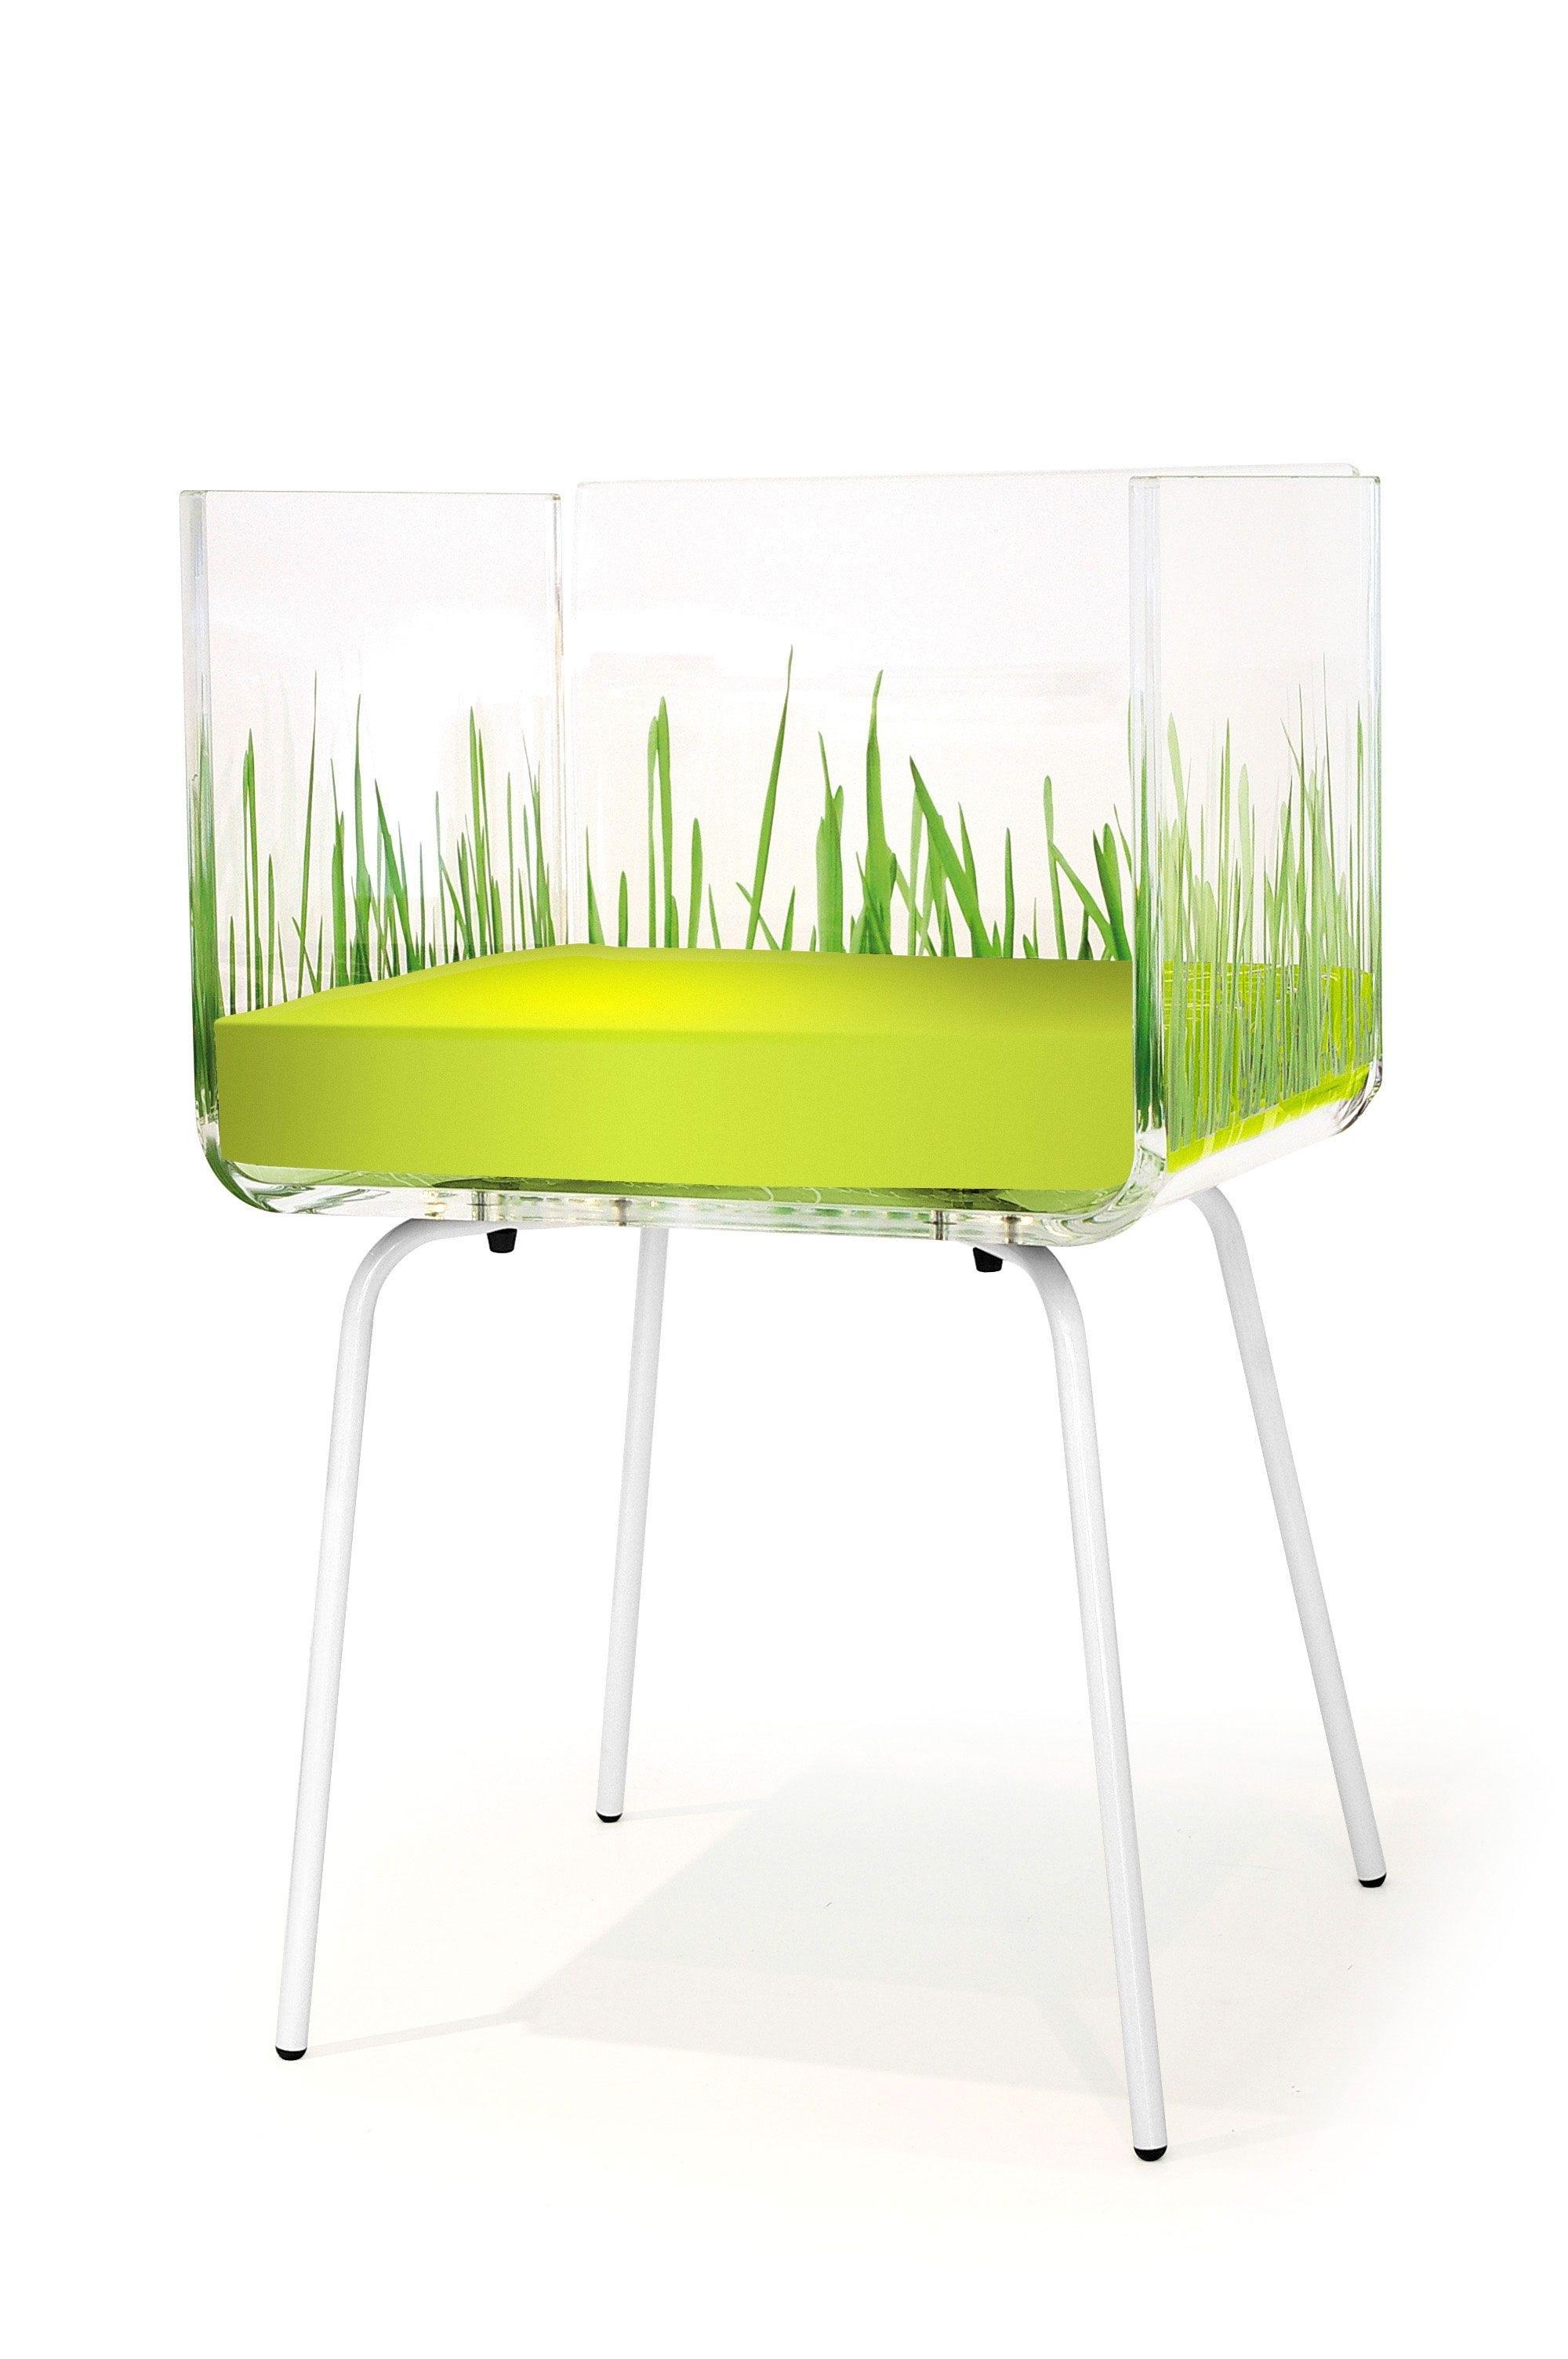 Chaise Transparente but Beau Photographie Chaise Plexi Transparente Best Chaises Plexiglas Inspirant Chaise